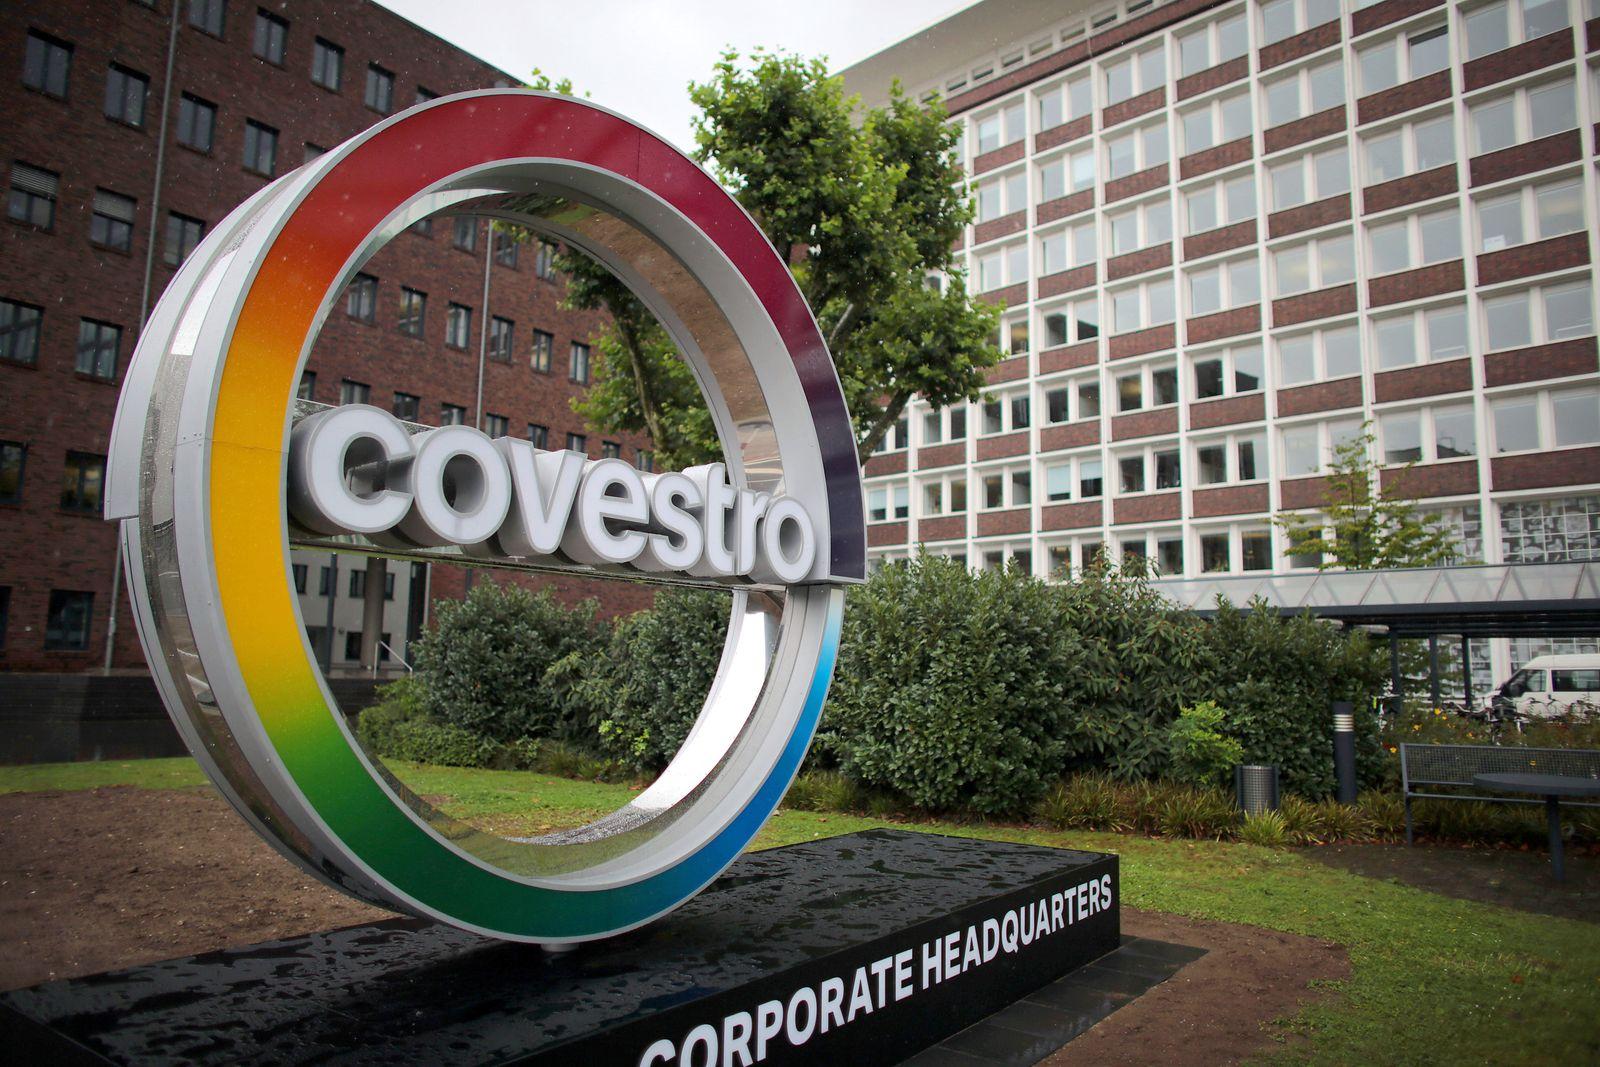 Covestro; HQ